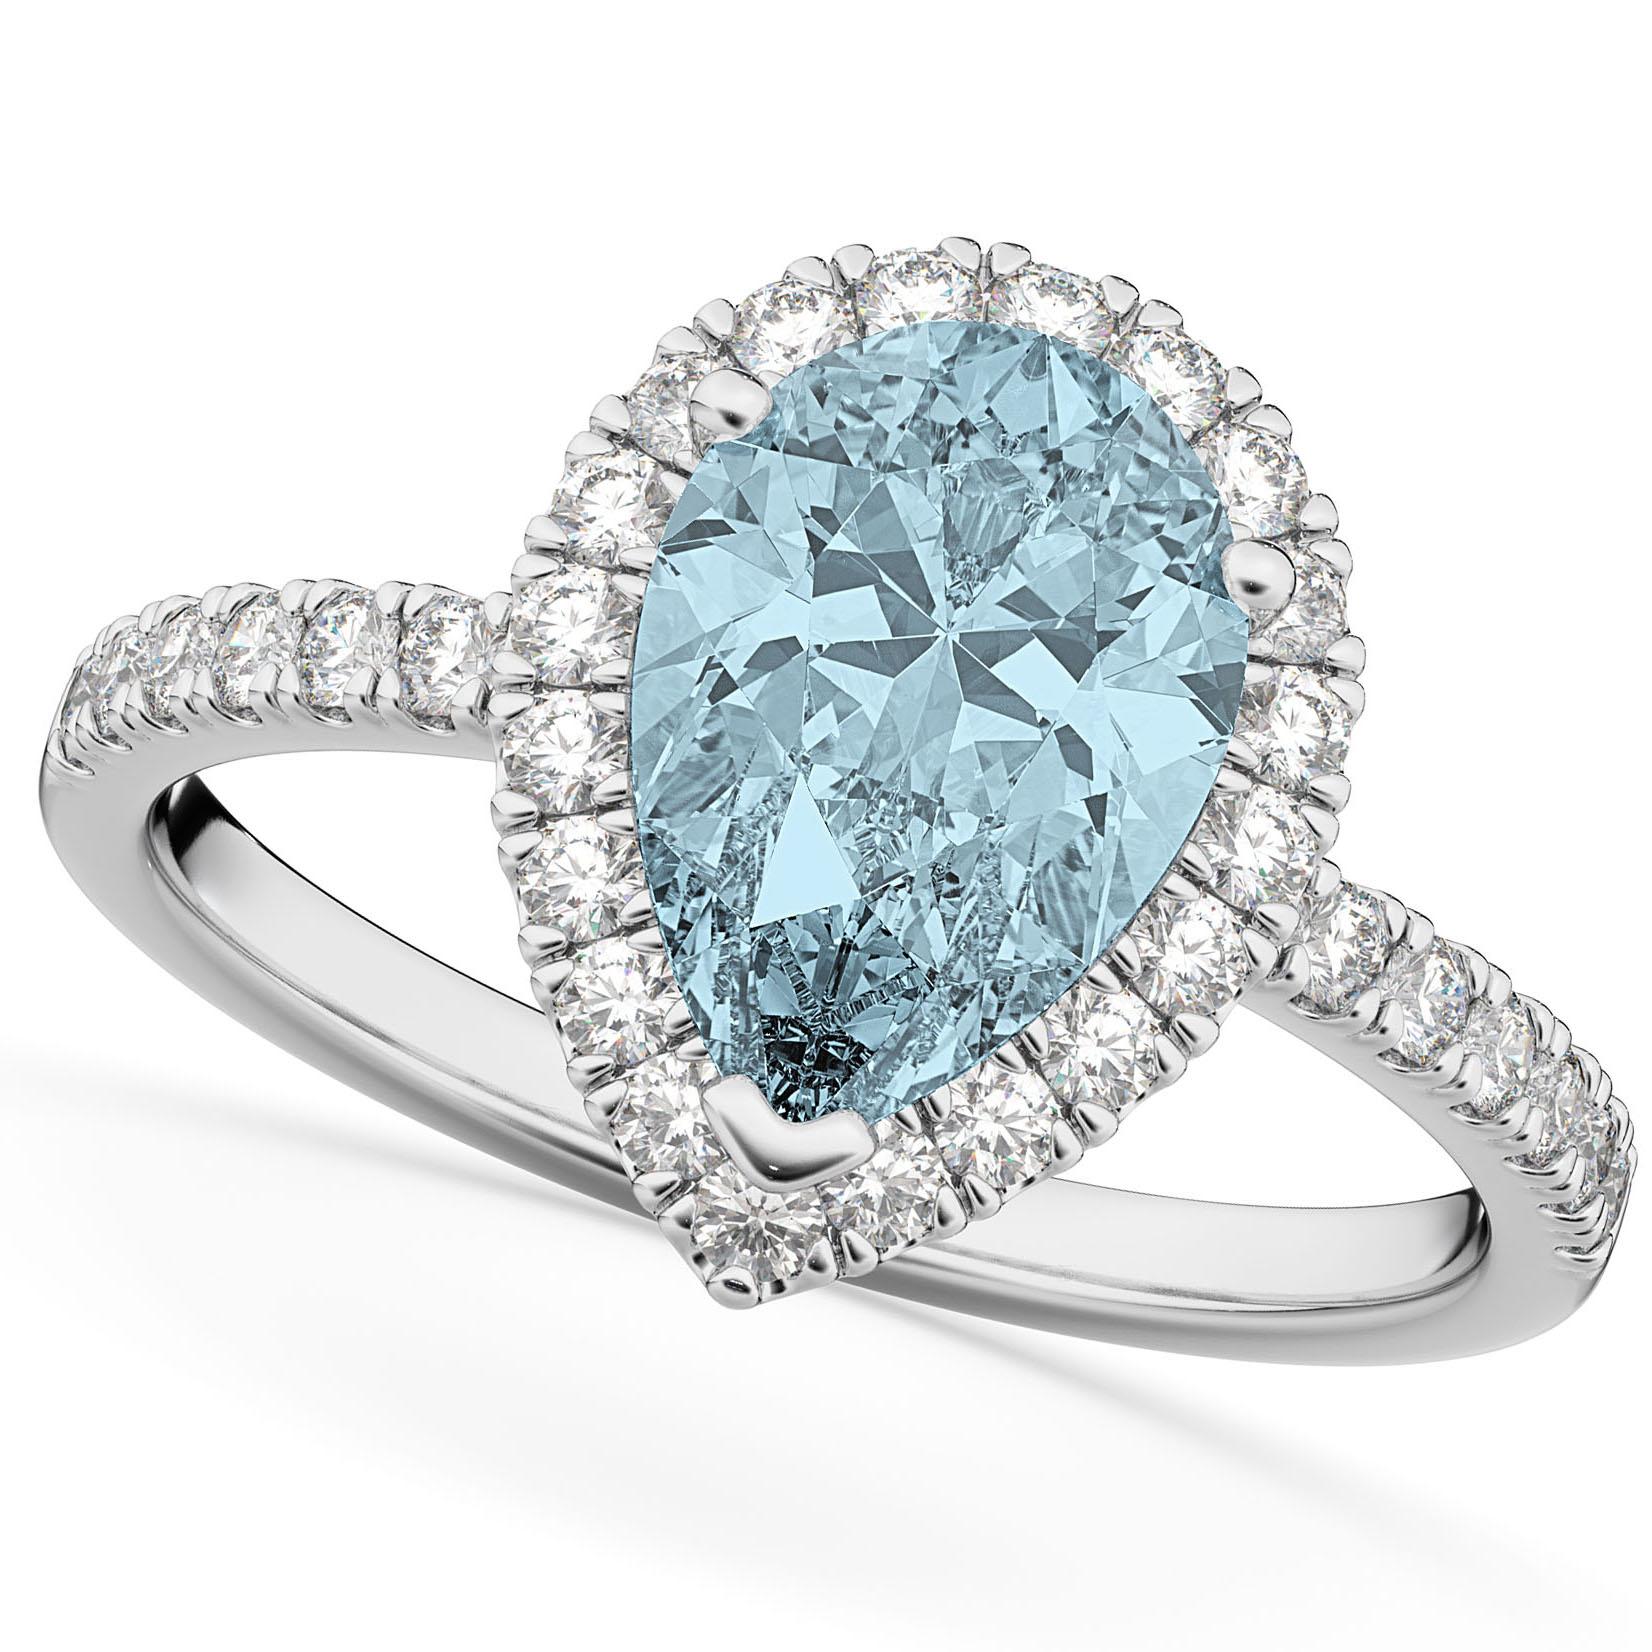 Pear Cut Halo Aquamarine & Diamond Engagement Ring 14K White Gold 2.36ct